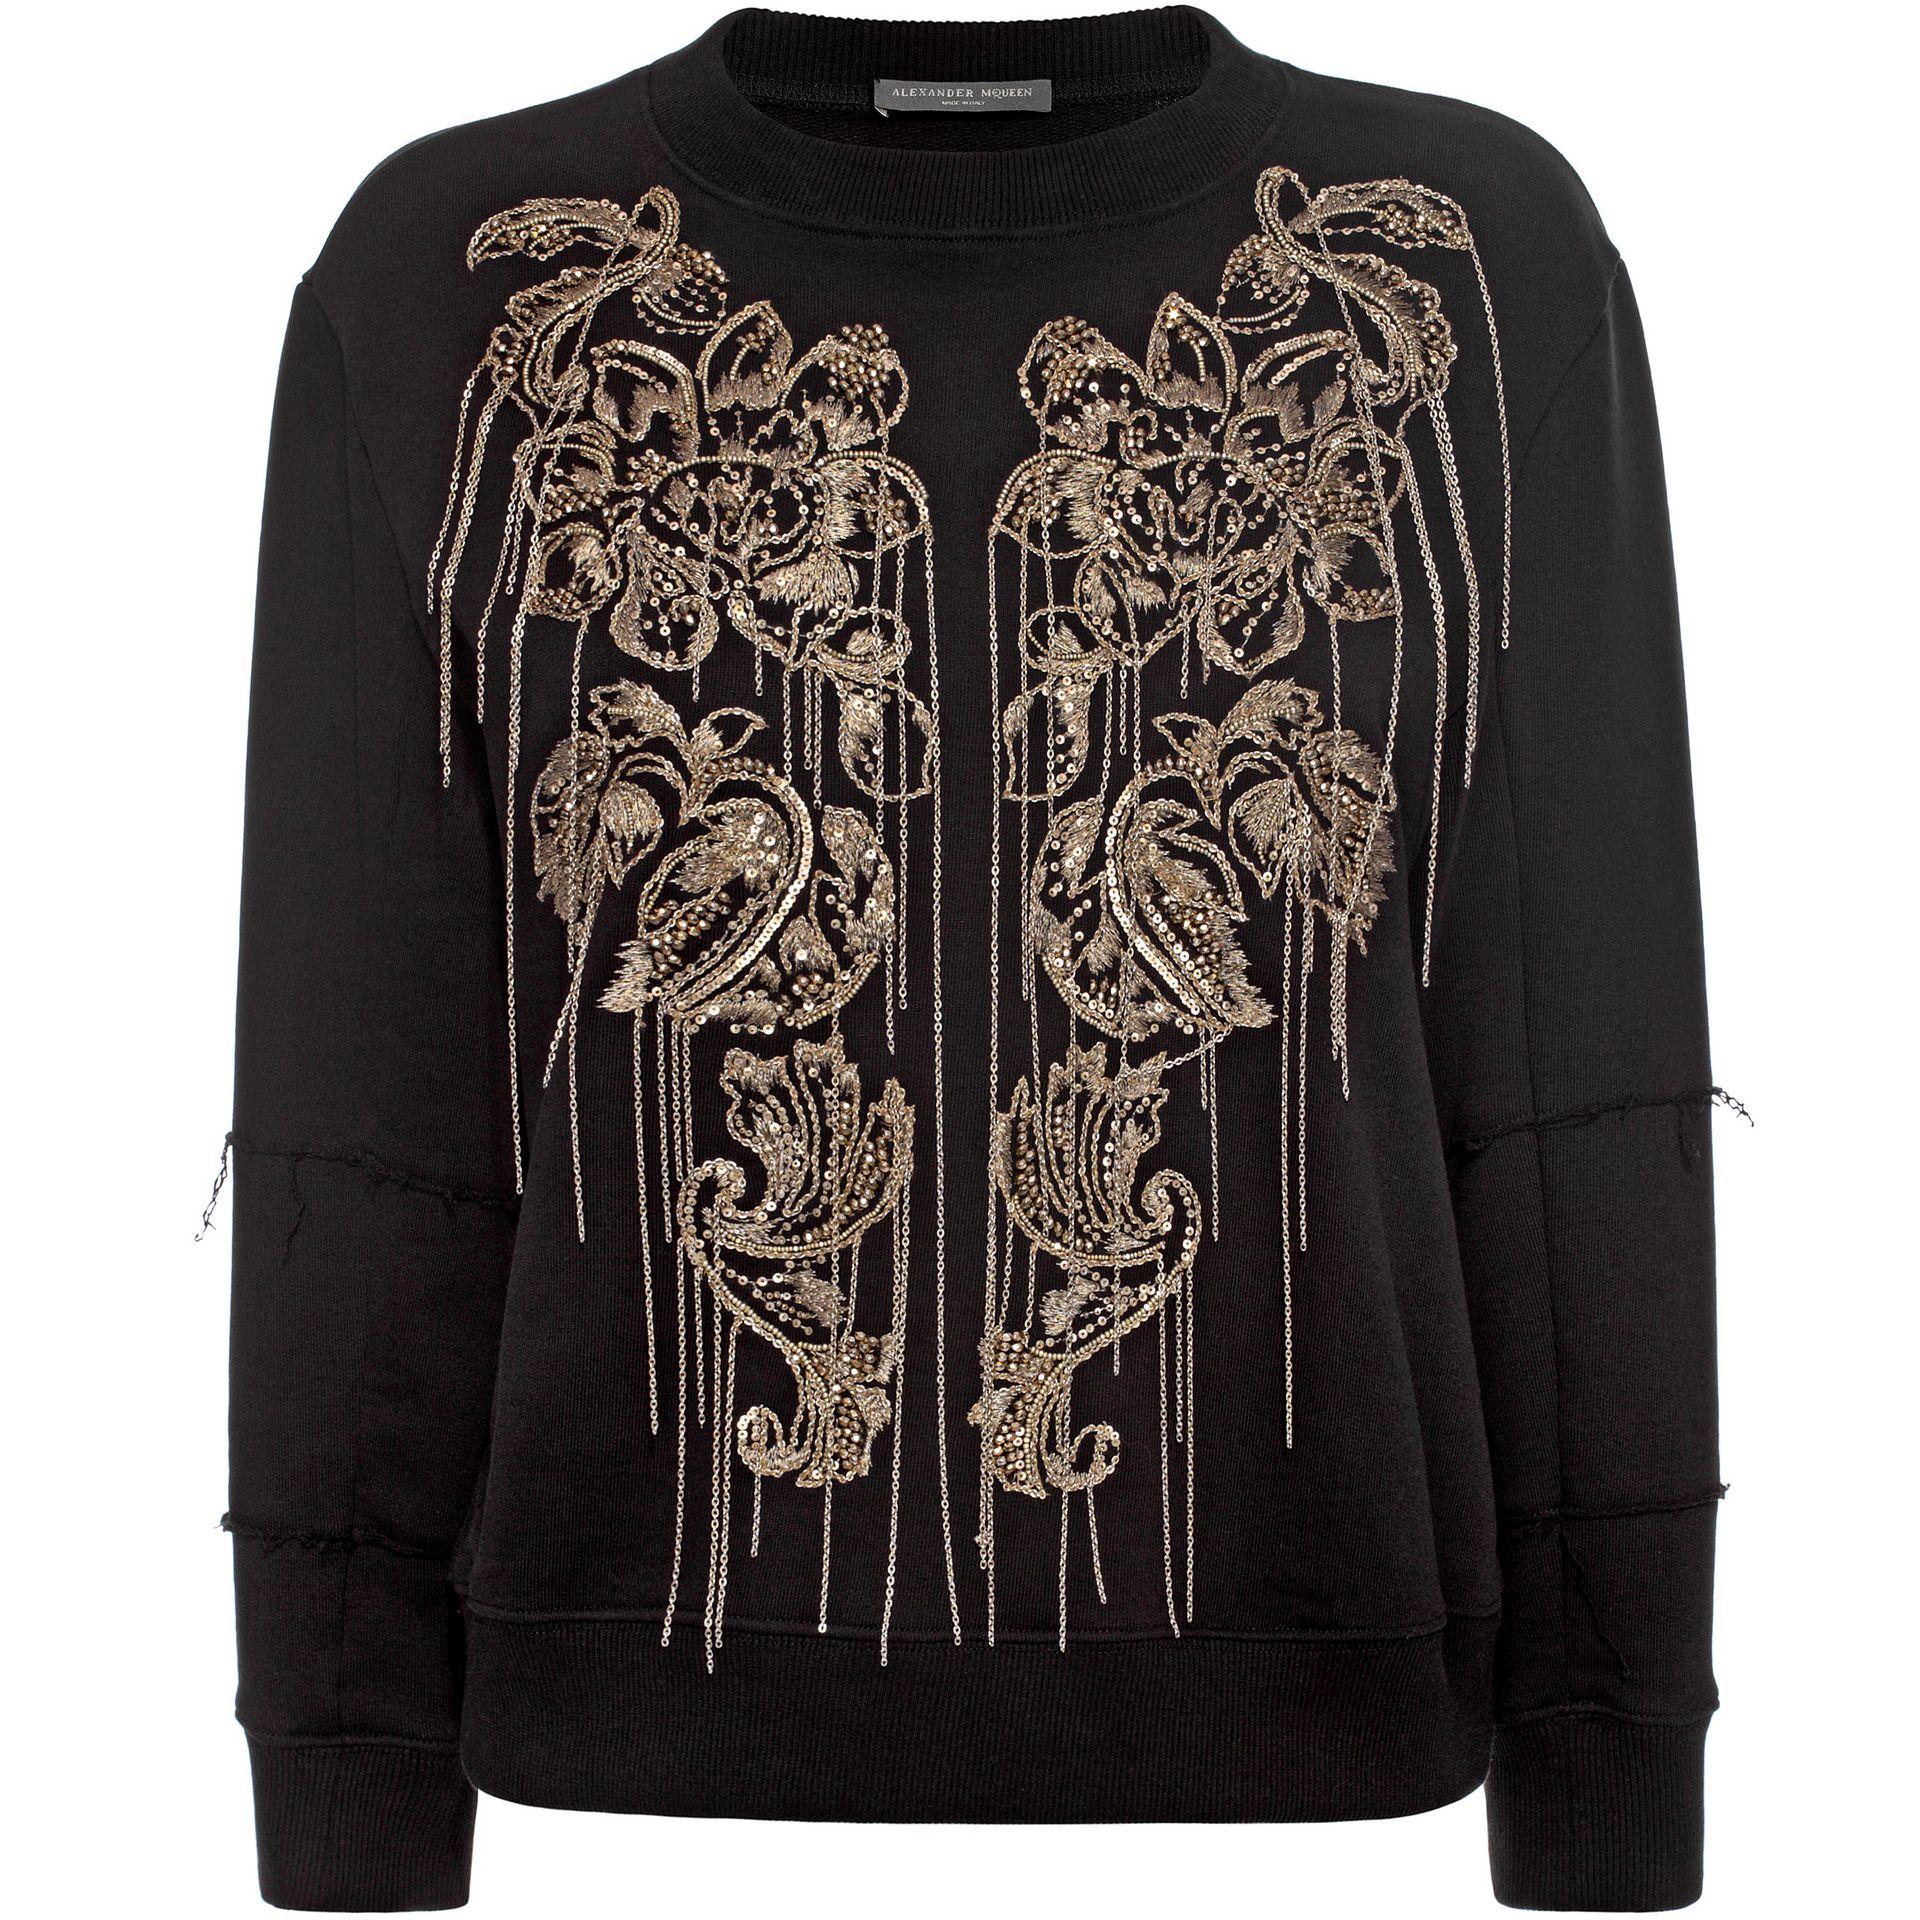 alexander mcqueen embellished cotton sweatshirt in black lyst. Black Bedroom Furniture Sets. Home Design Ideas